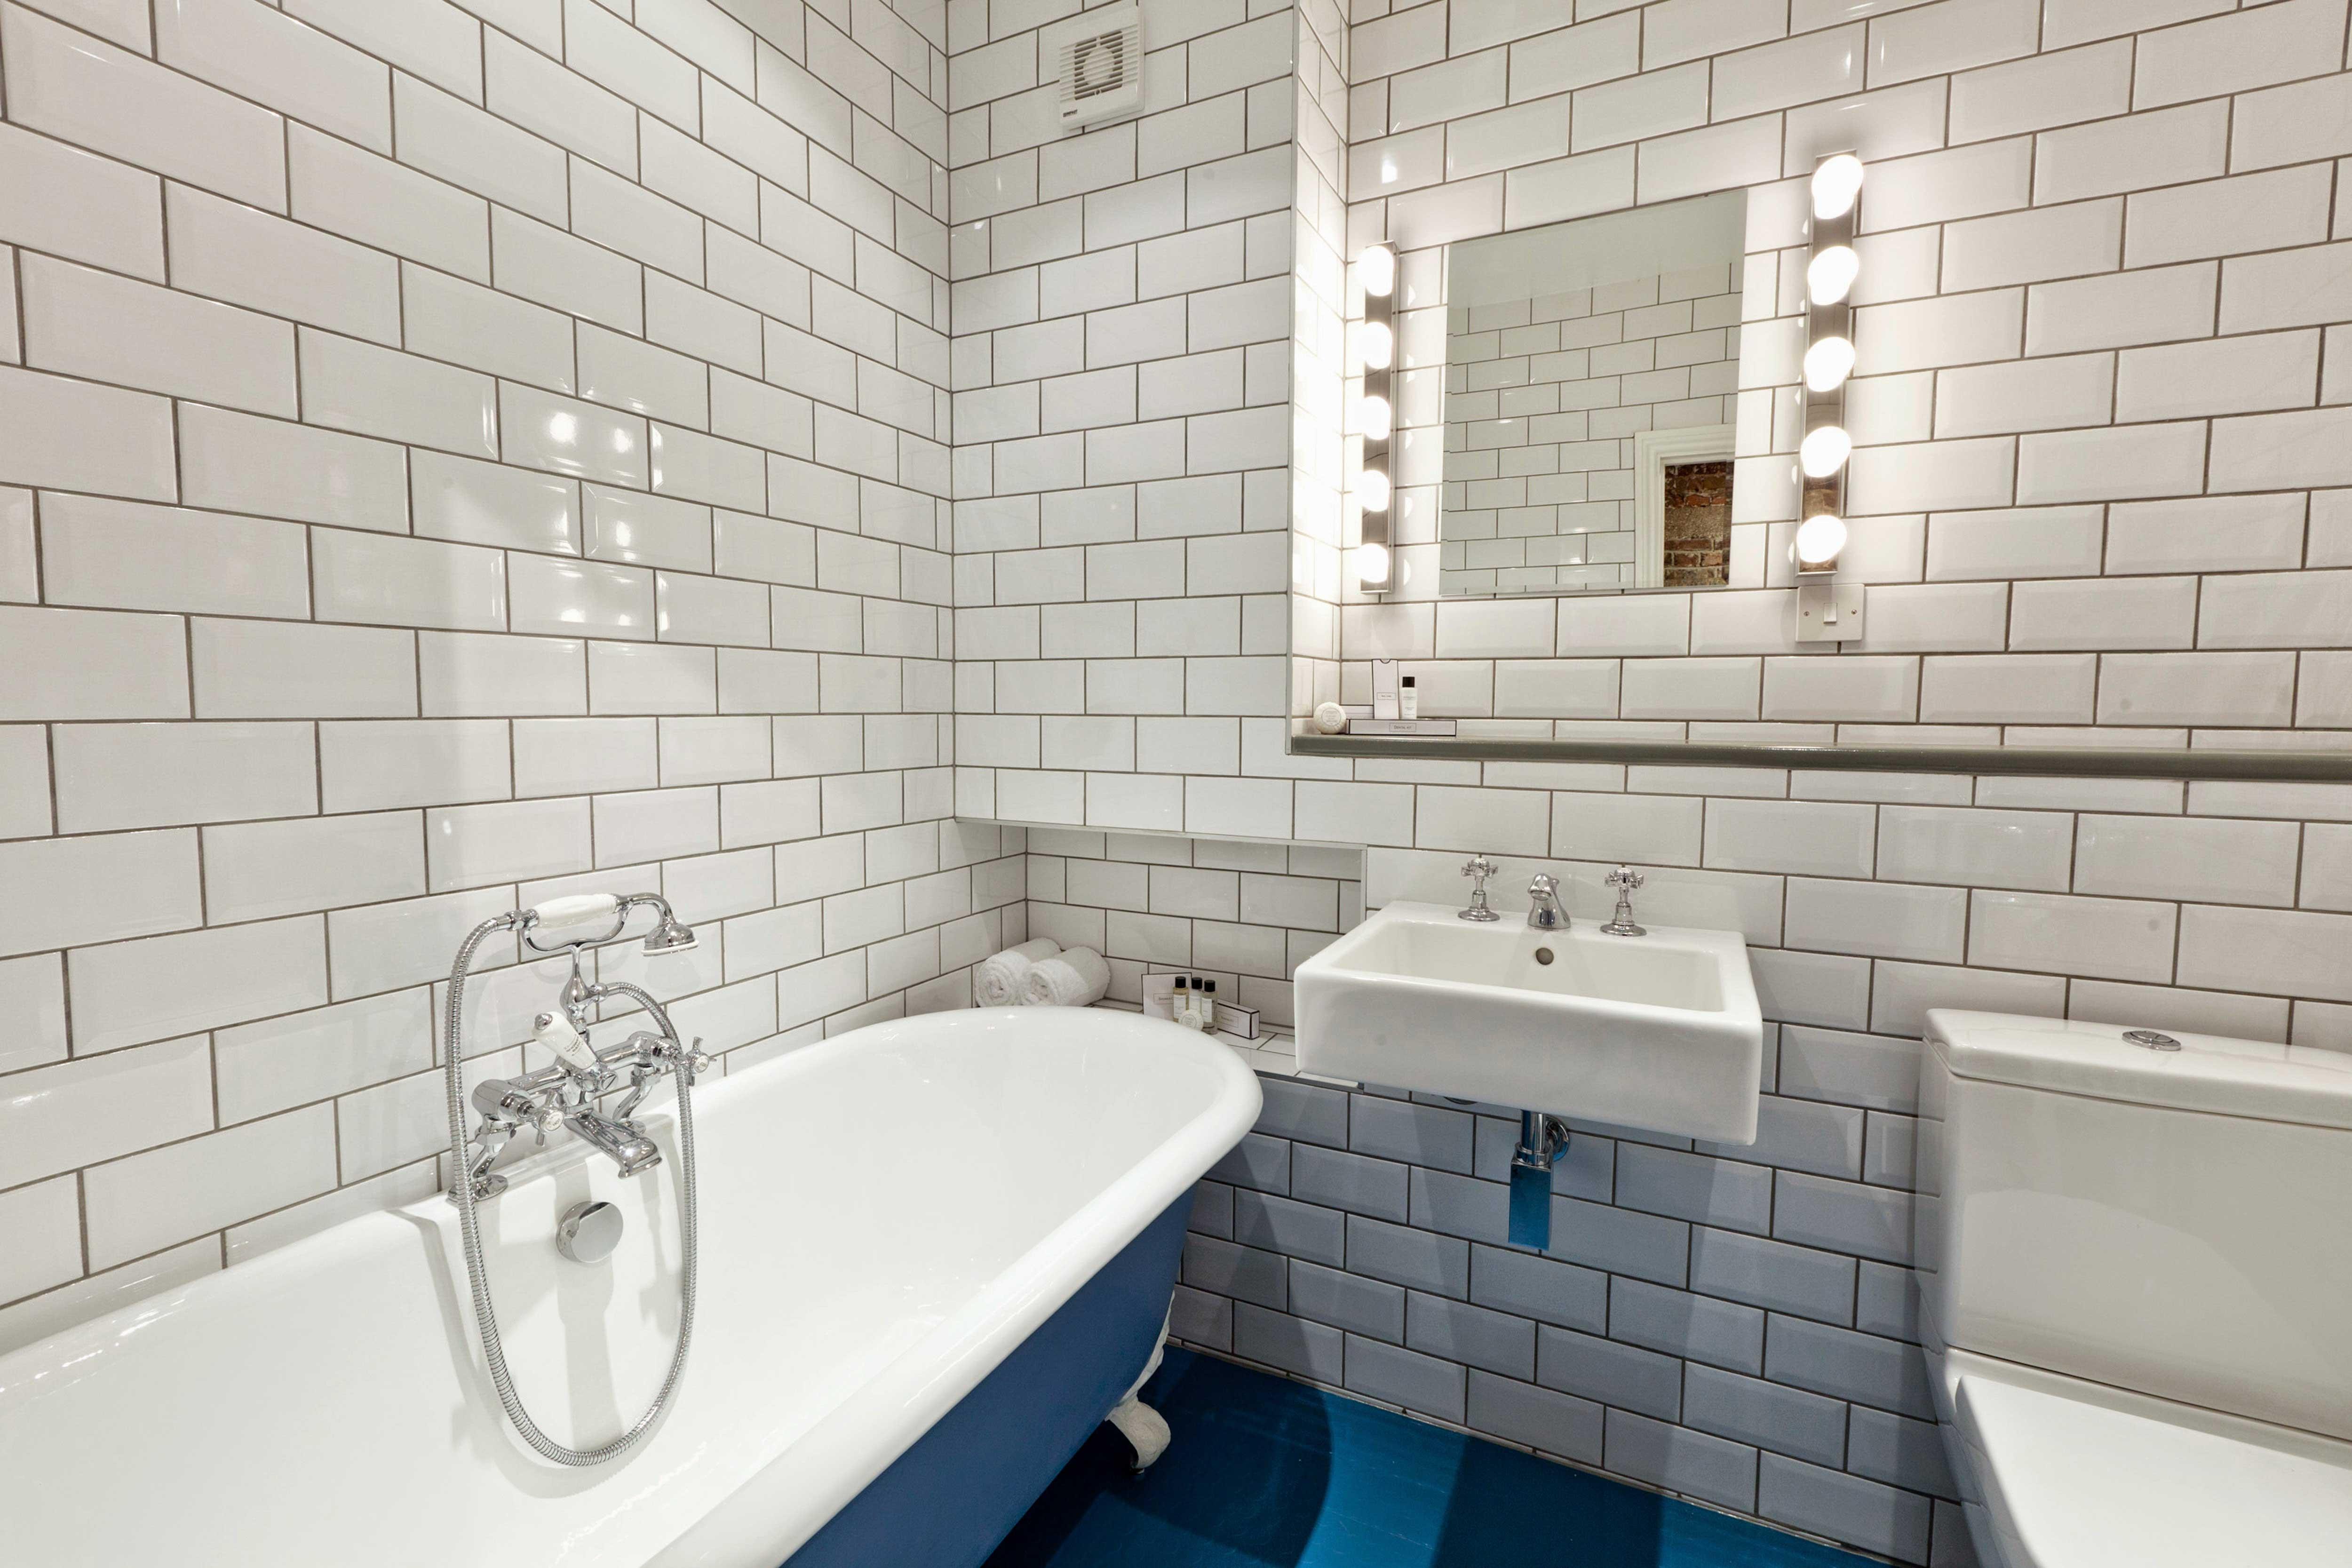 baignoire bleue. Black Bedroom Furniture Sets. Home Design Ideas